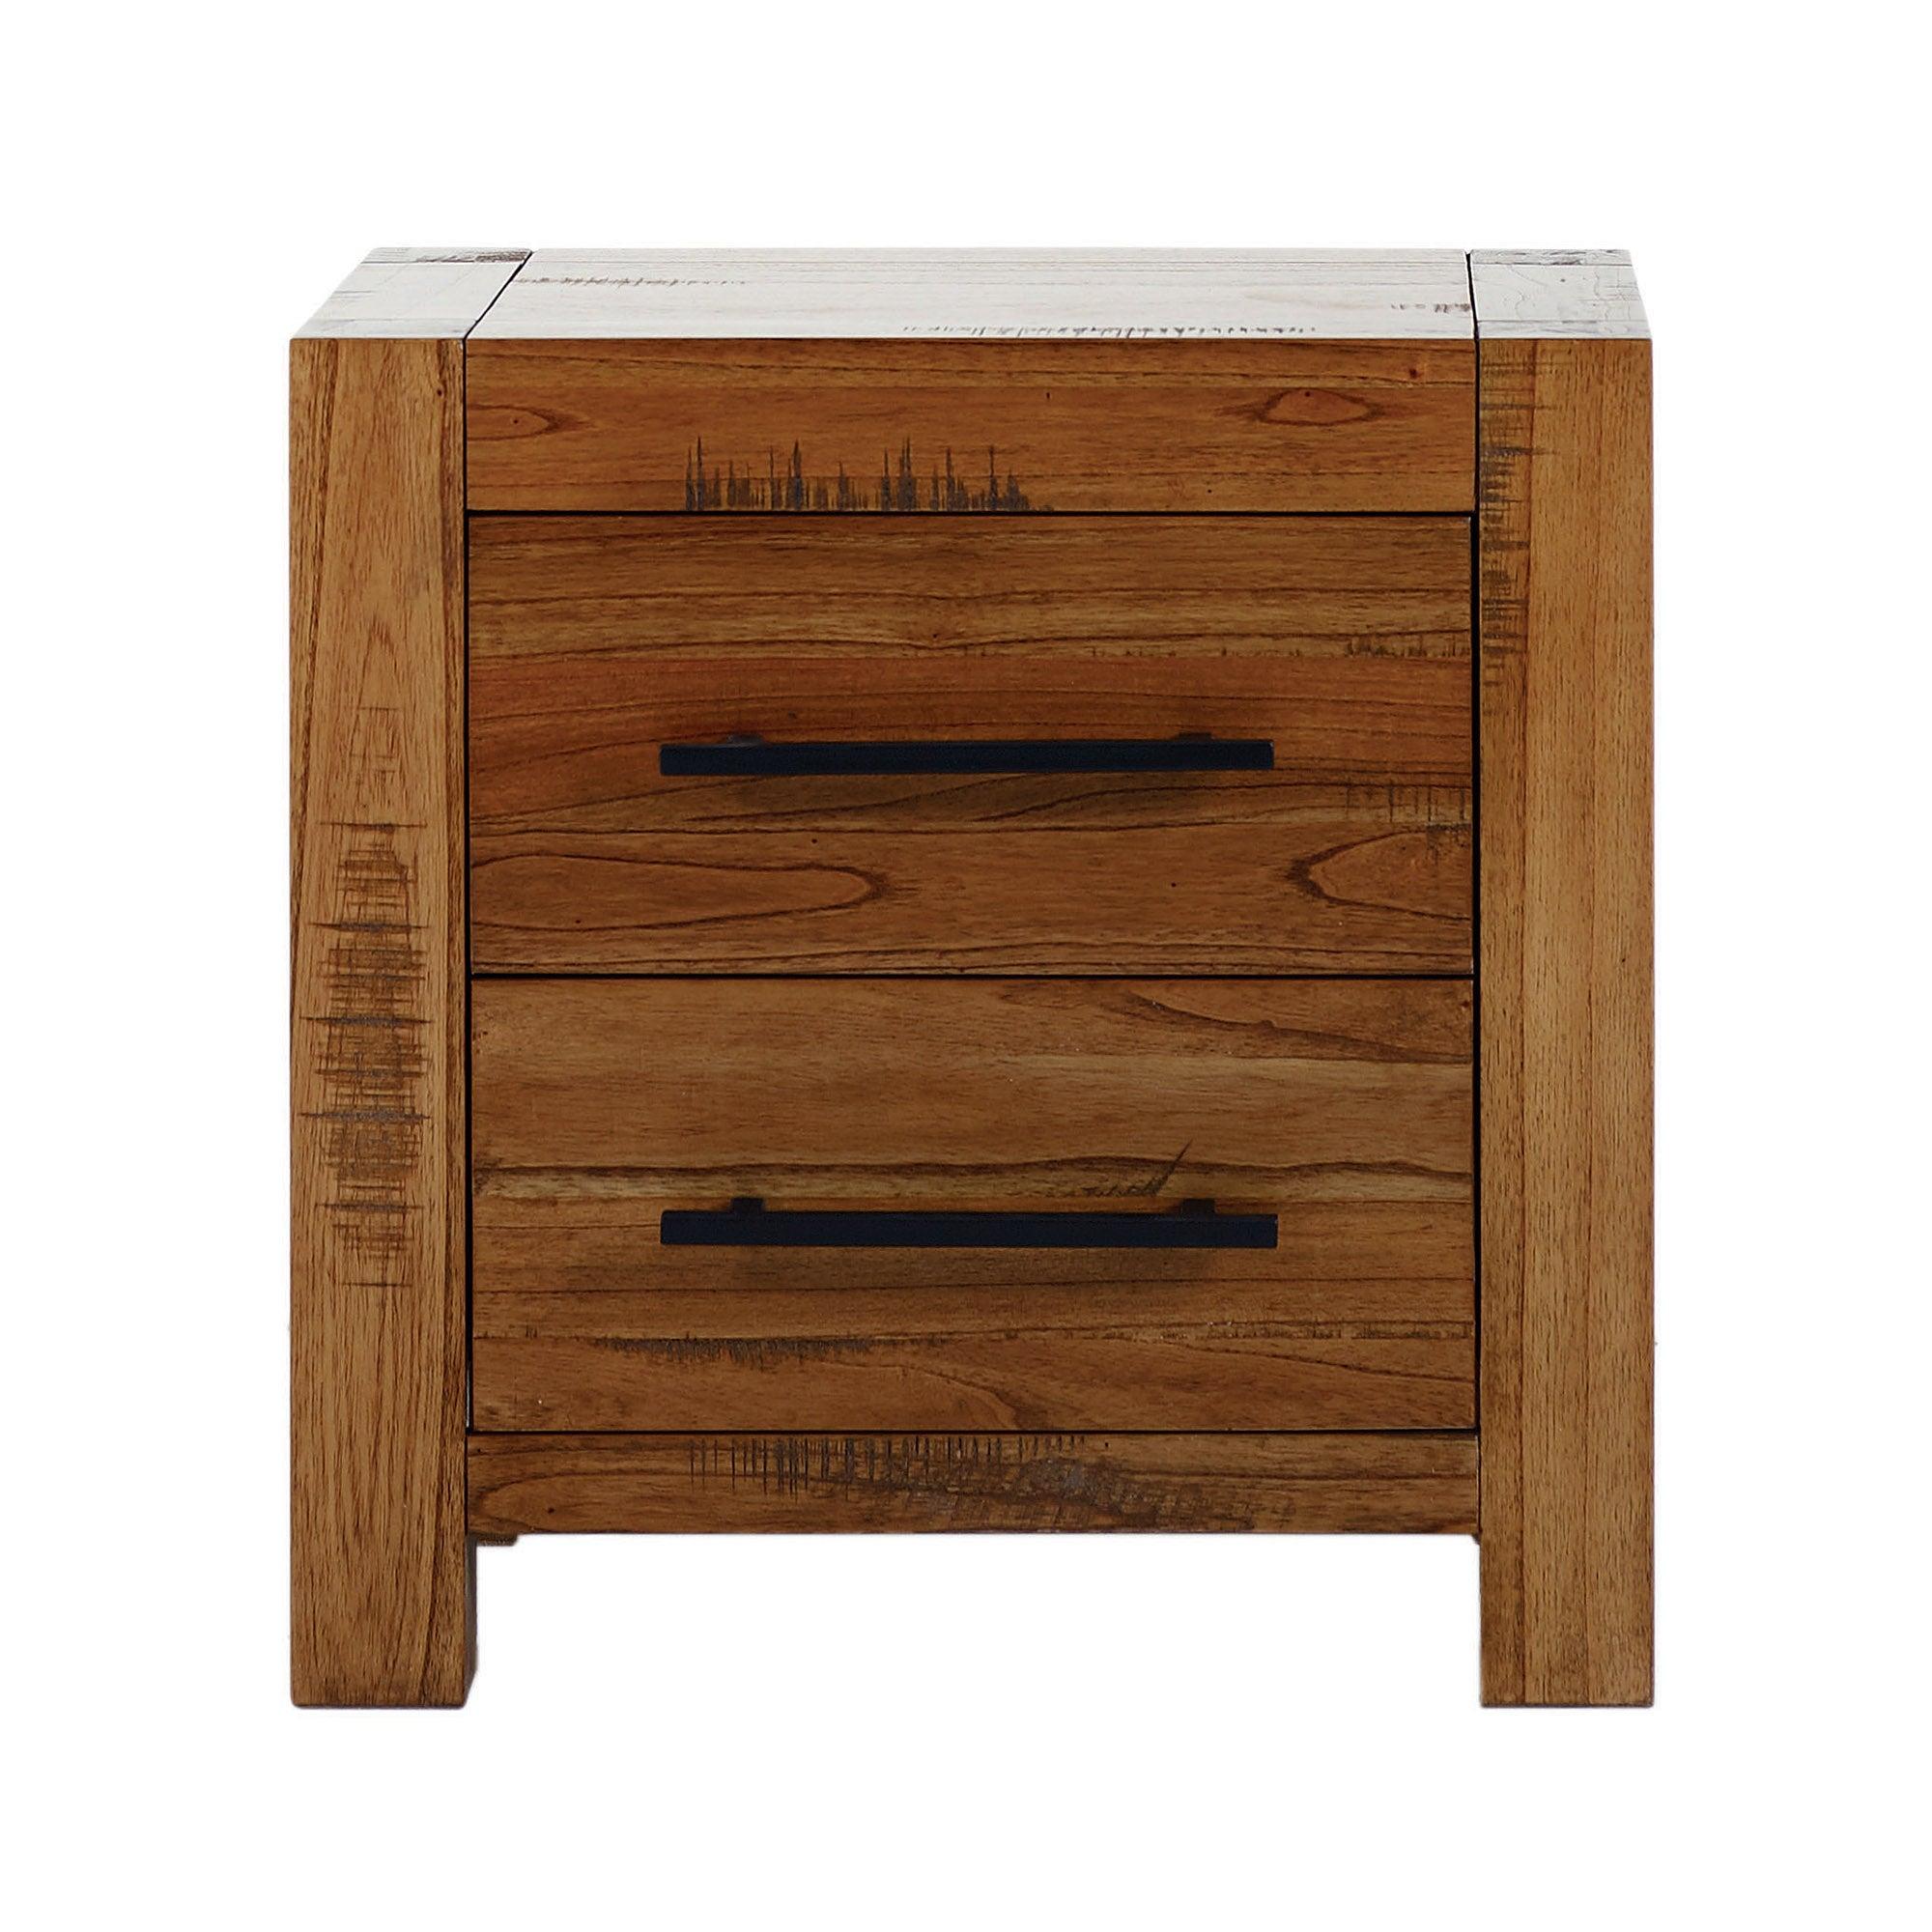 Columbia Acacia Dark Wood 2 Drawer Bedside Table